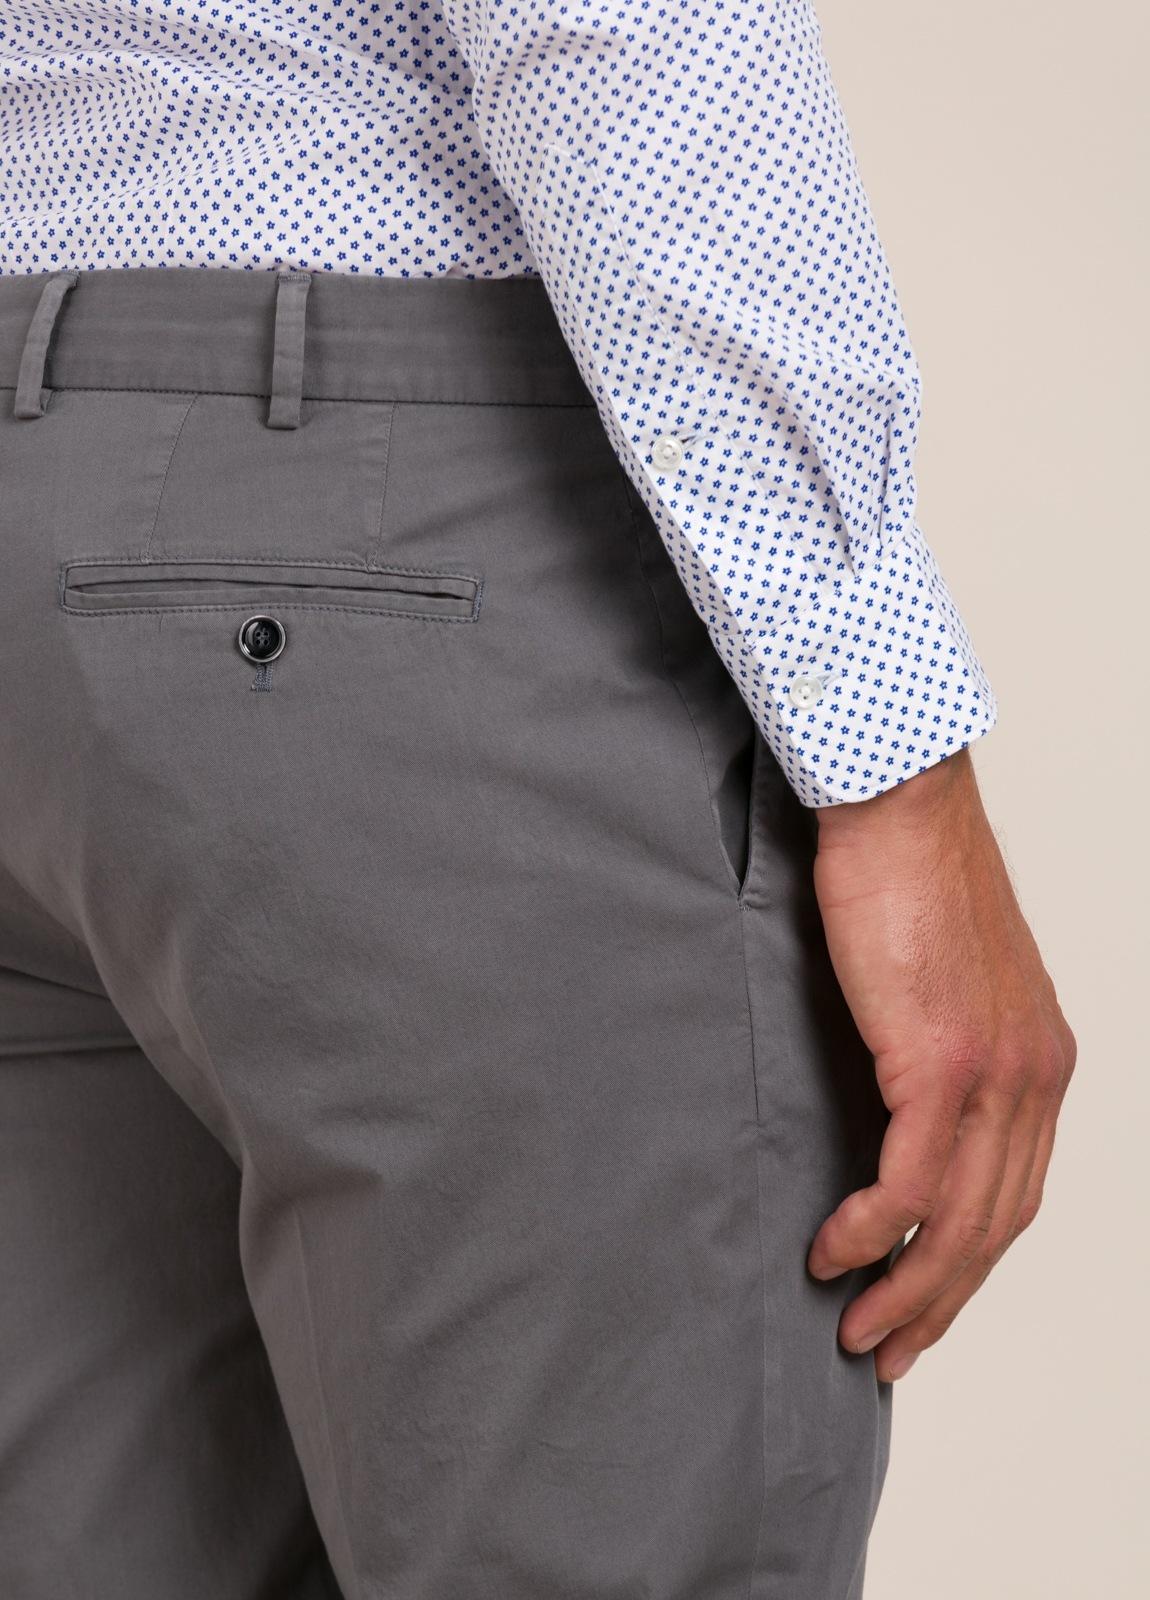 Pantalón chino FUREST COLECCIÓN Slim Fit gris - Ítem1